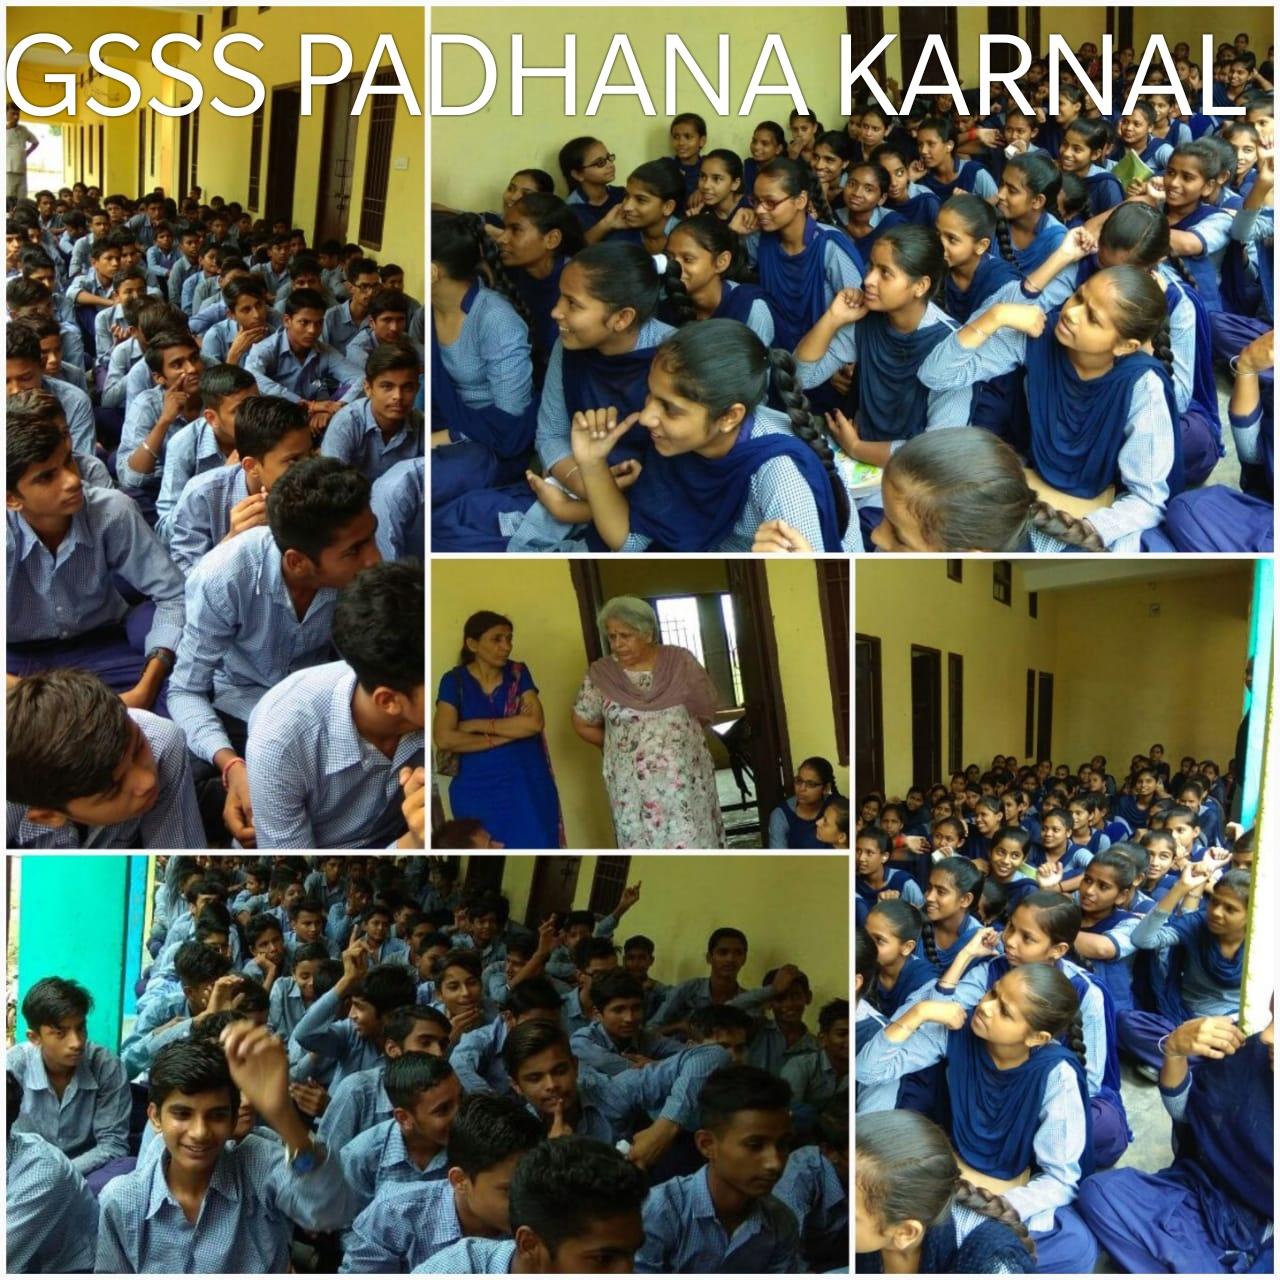 GSSS PADHANA KARNAL.jpeg